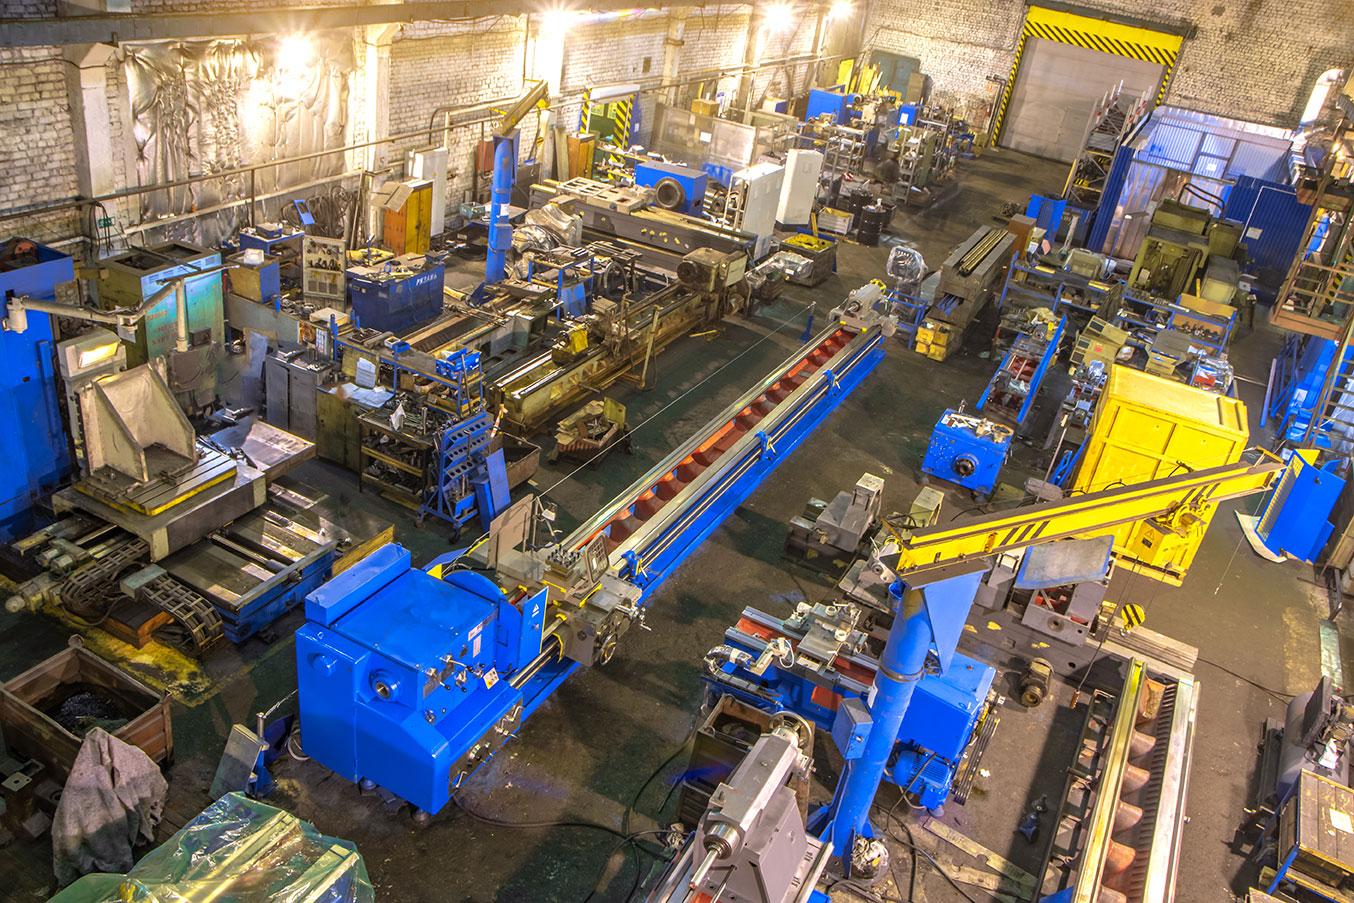 Industrial Neworleans